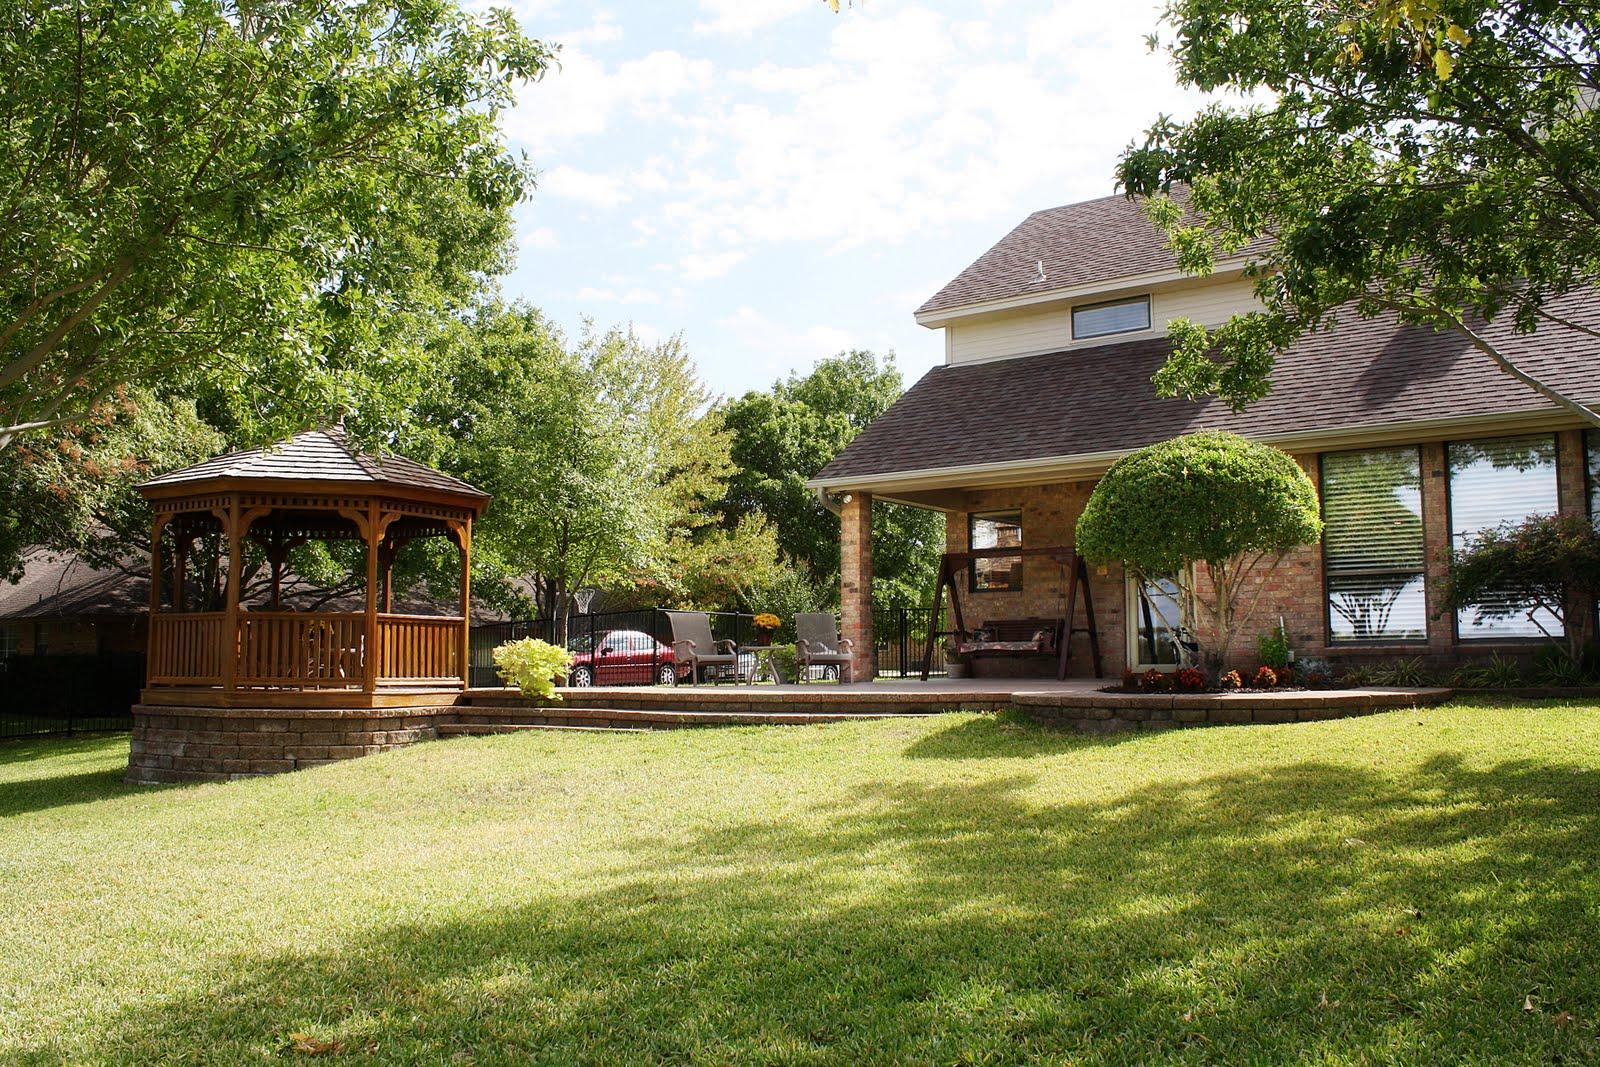 backyard golf course view with gazebo